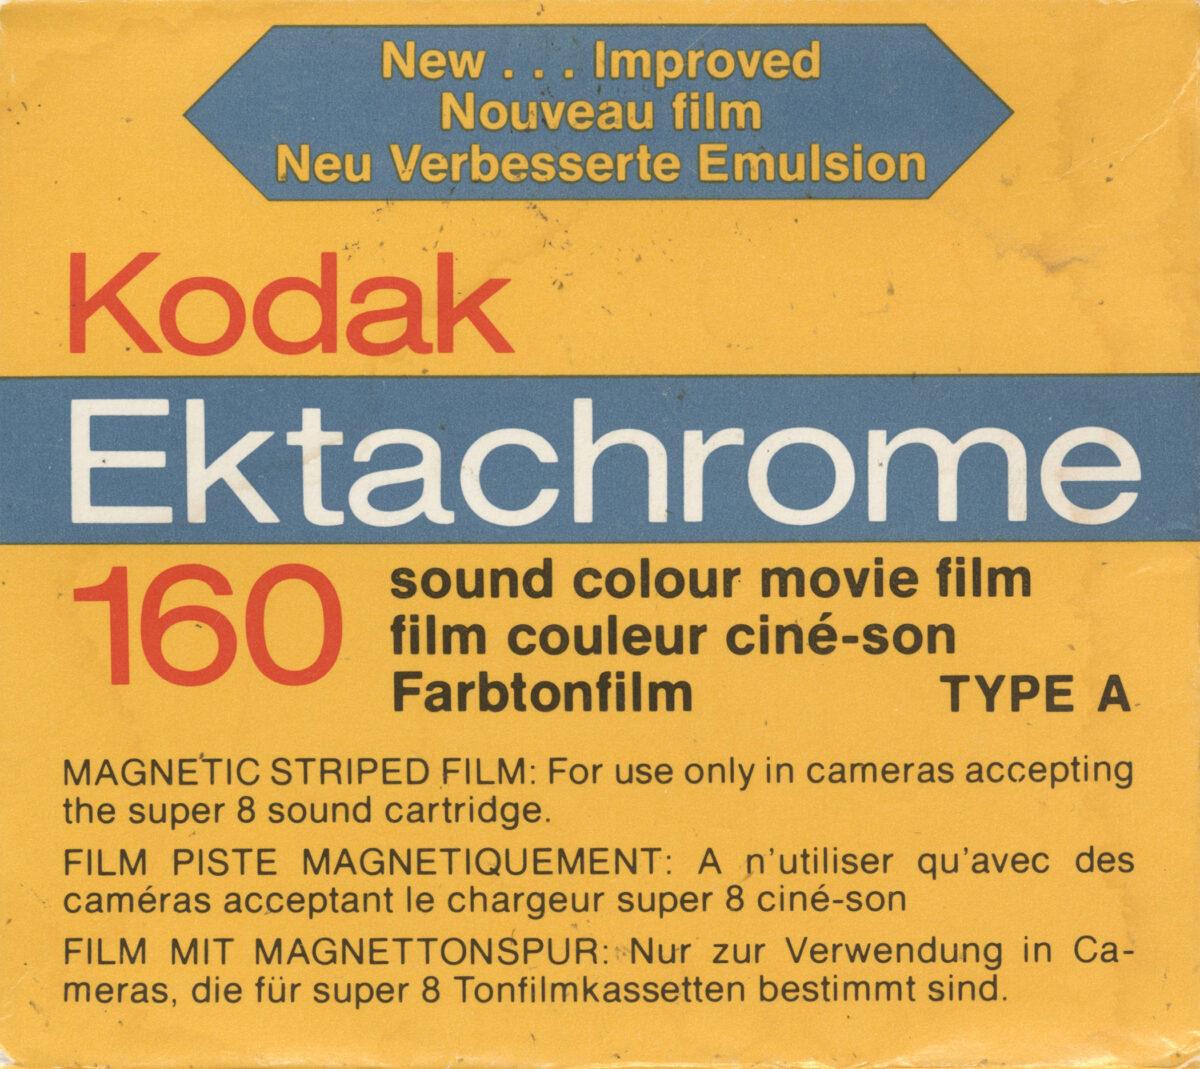 Kodak-Ektachrome-160-sound